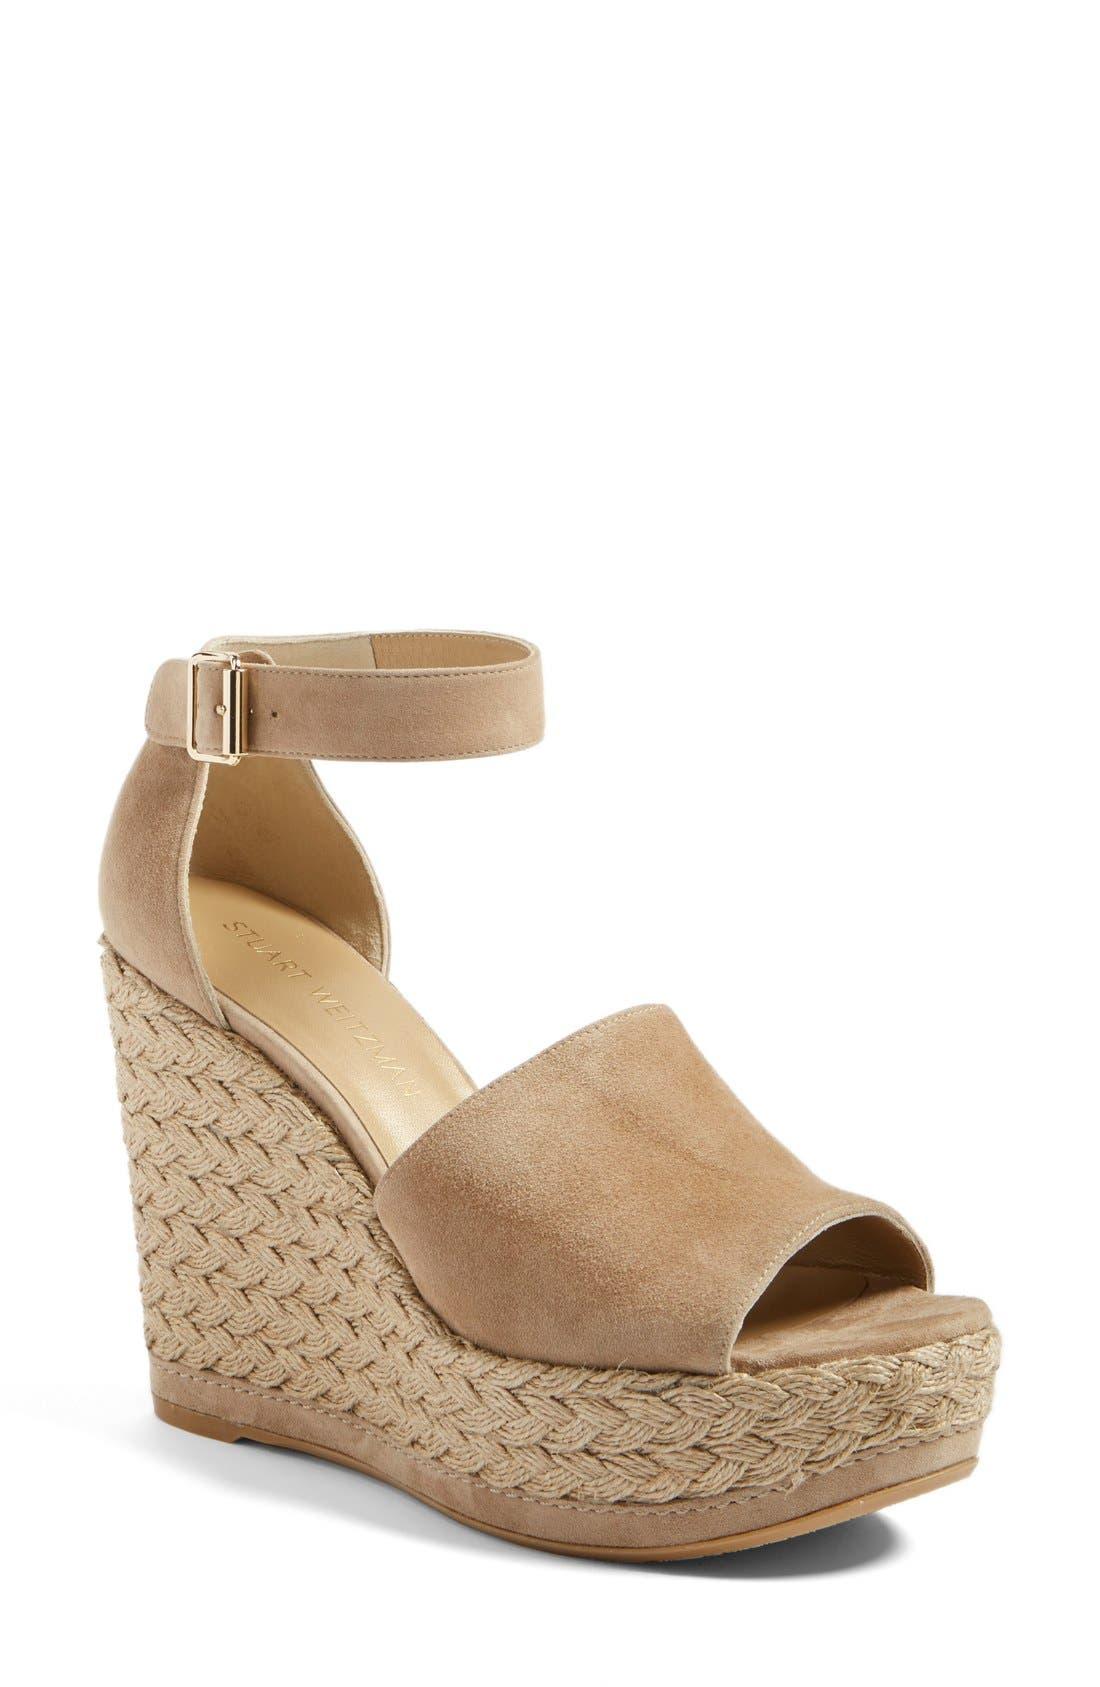 Main Image - Stuart Weitzman Sohojute Platform Wedge Sandal (Women)